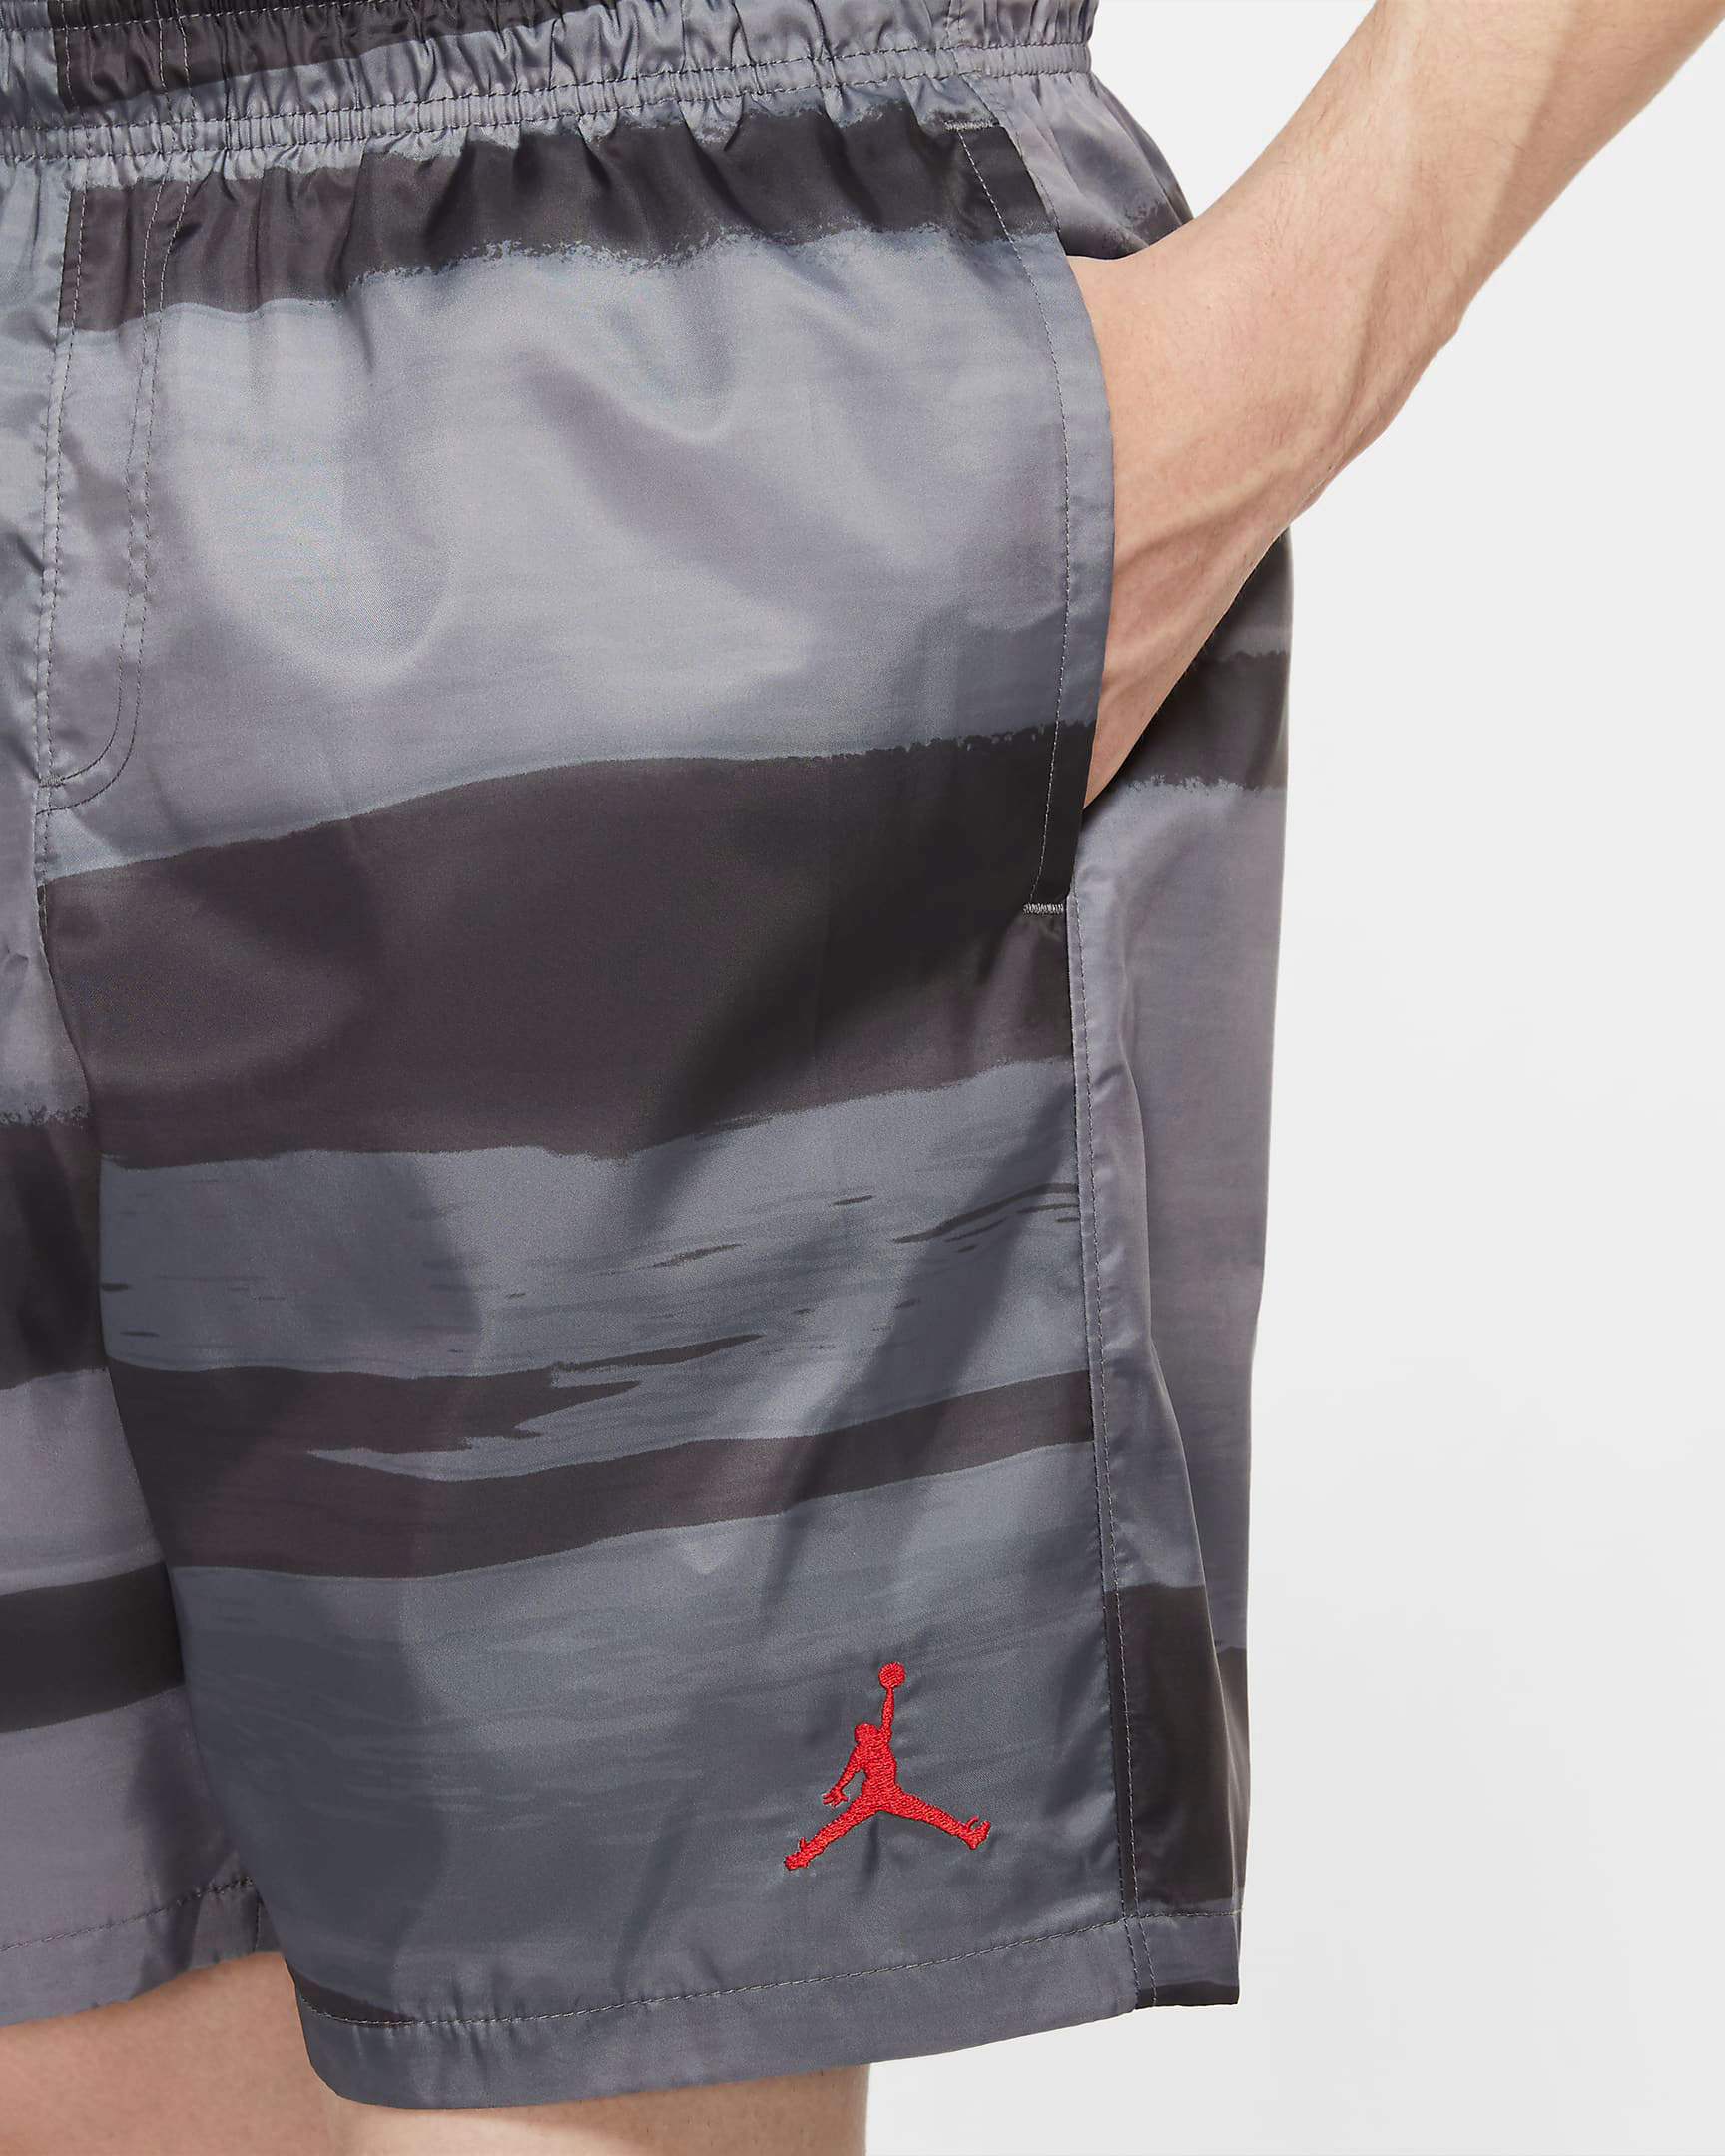 air-jordan-11-low-ie-black-cement-shorts-to-match-3